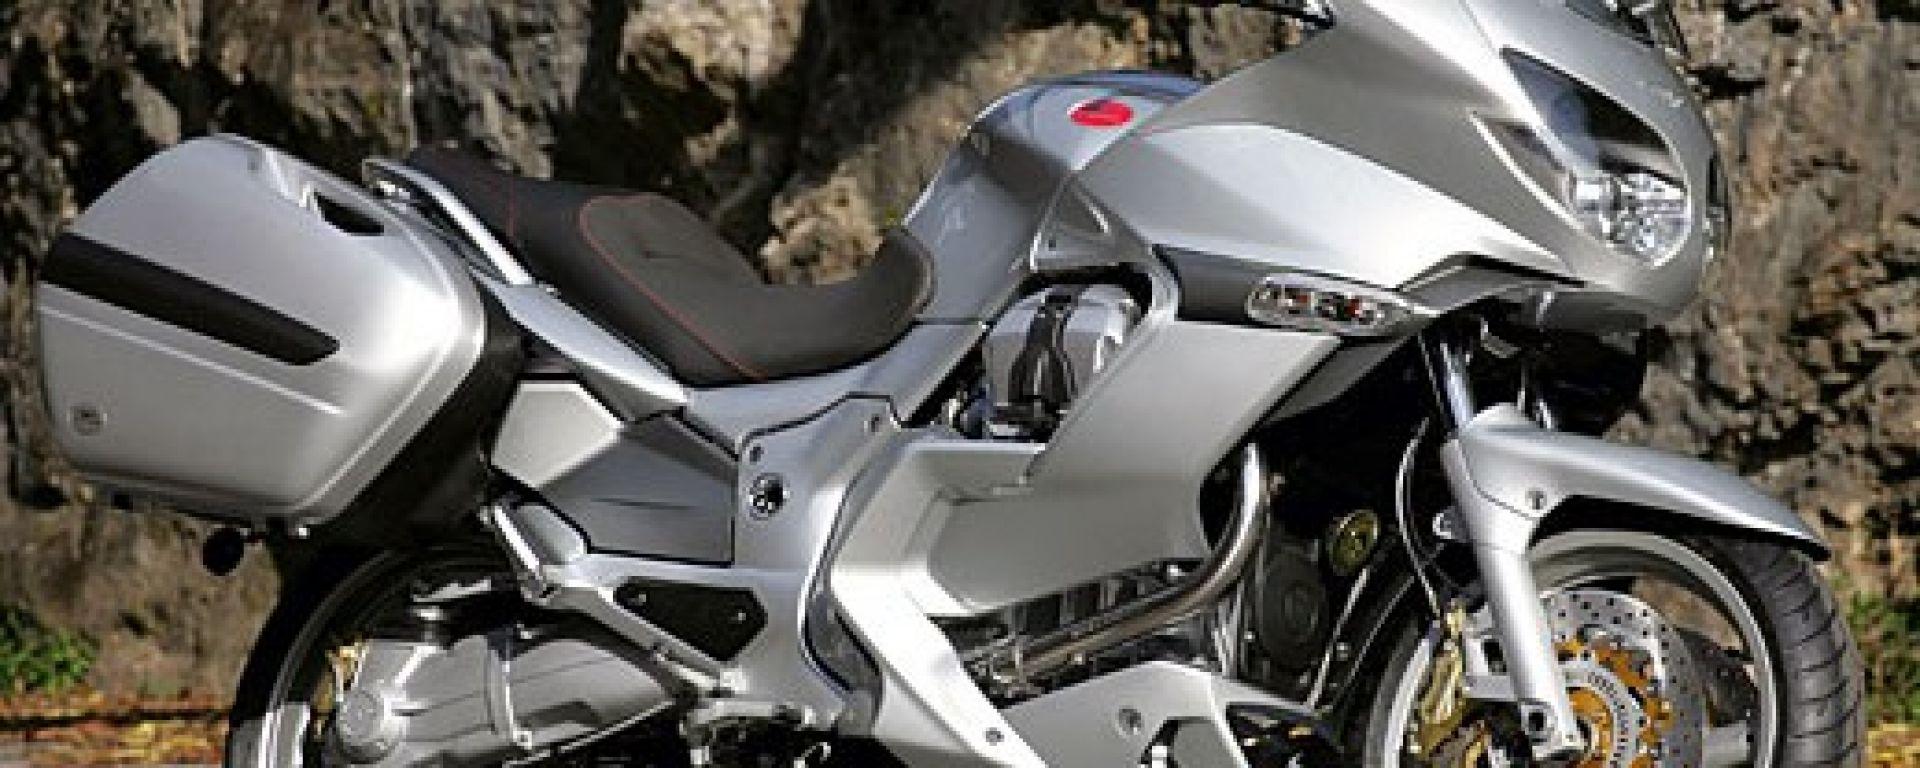 prova: moto guzzi norge 1200 - motorbox